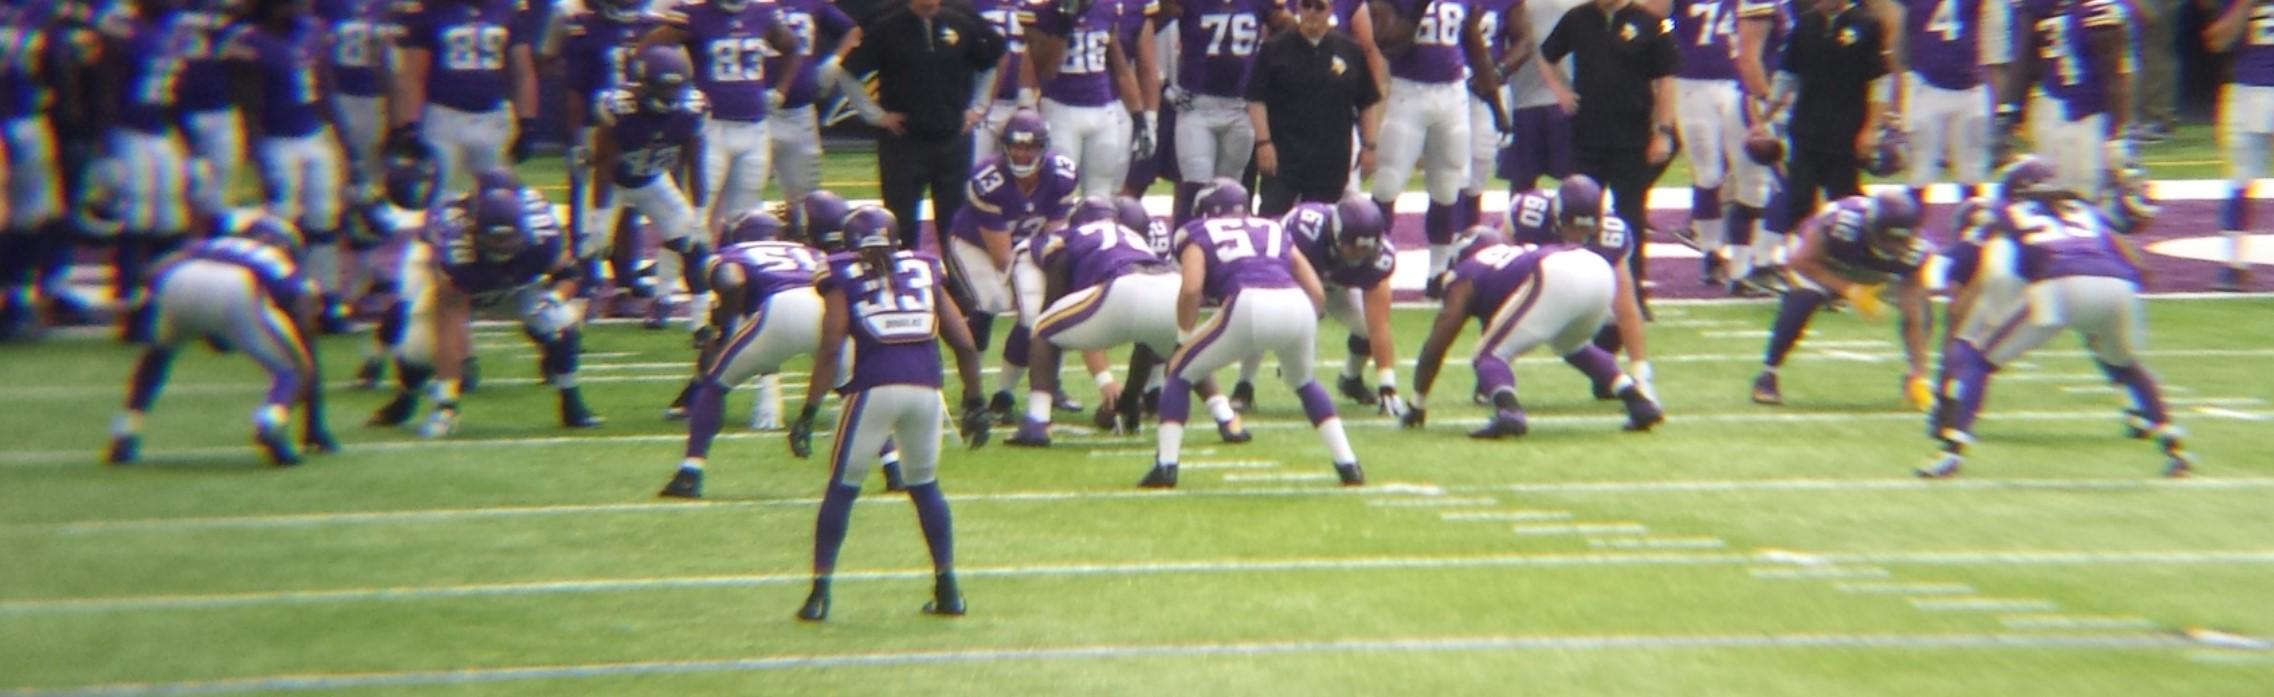 Minnesota Vikings U.S. Bank Stadium First Game - Shaun Hill